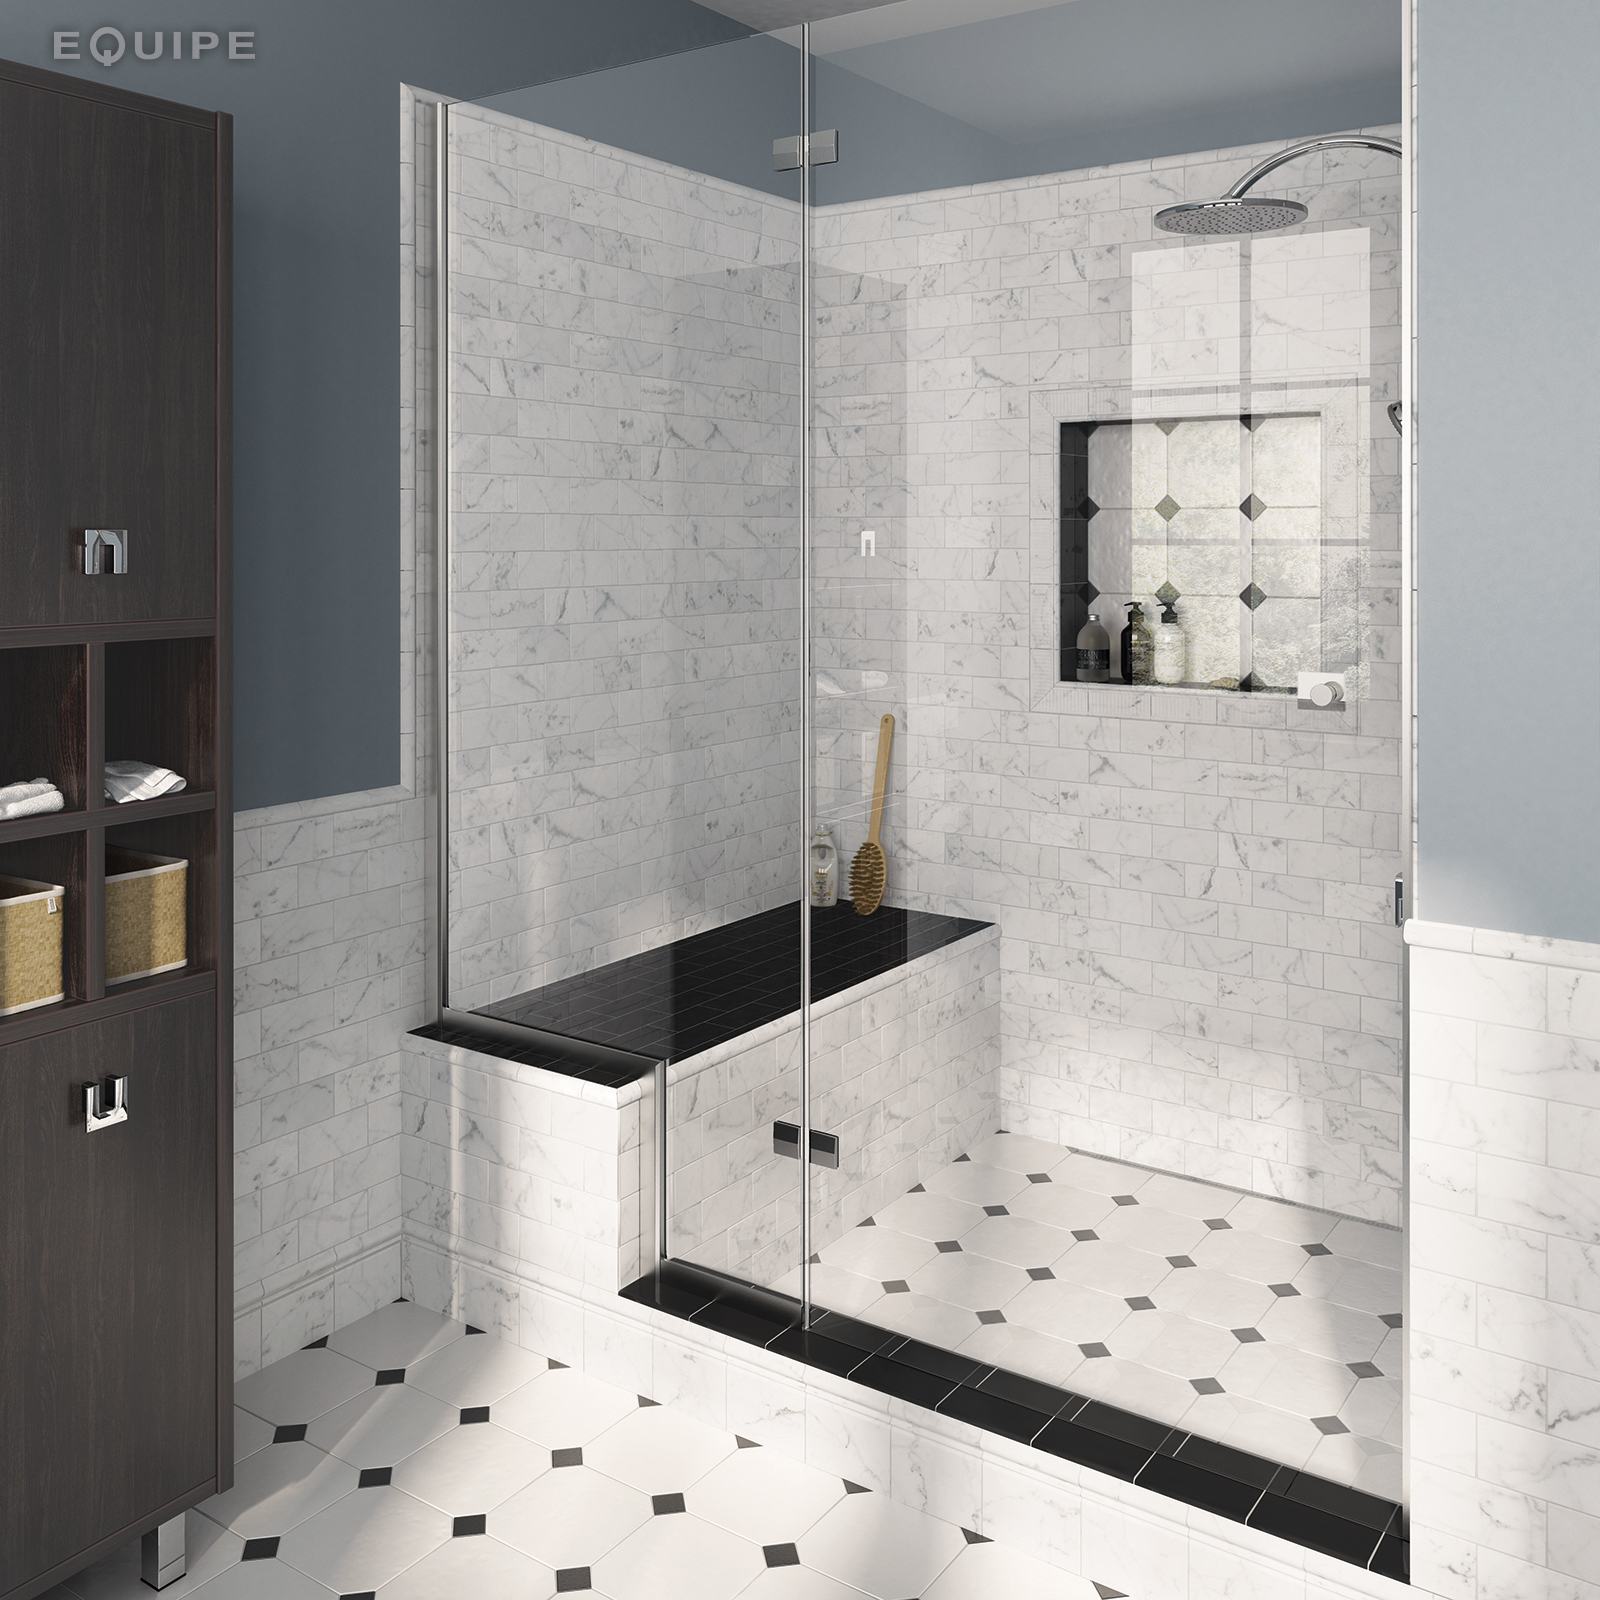 Carrara7,5x15 brillo pencil bath